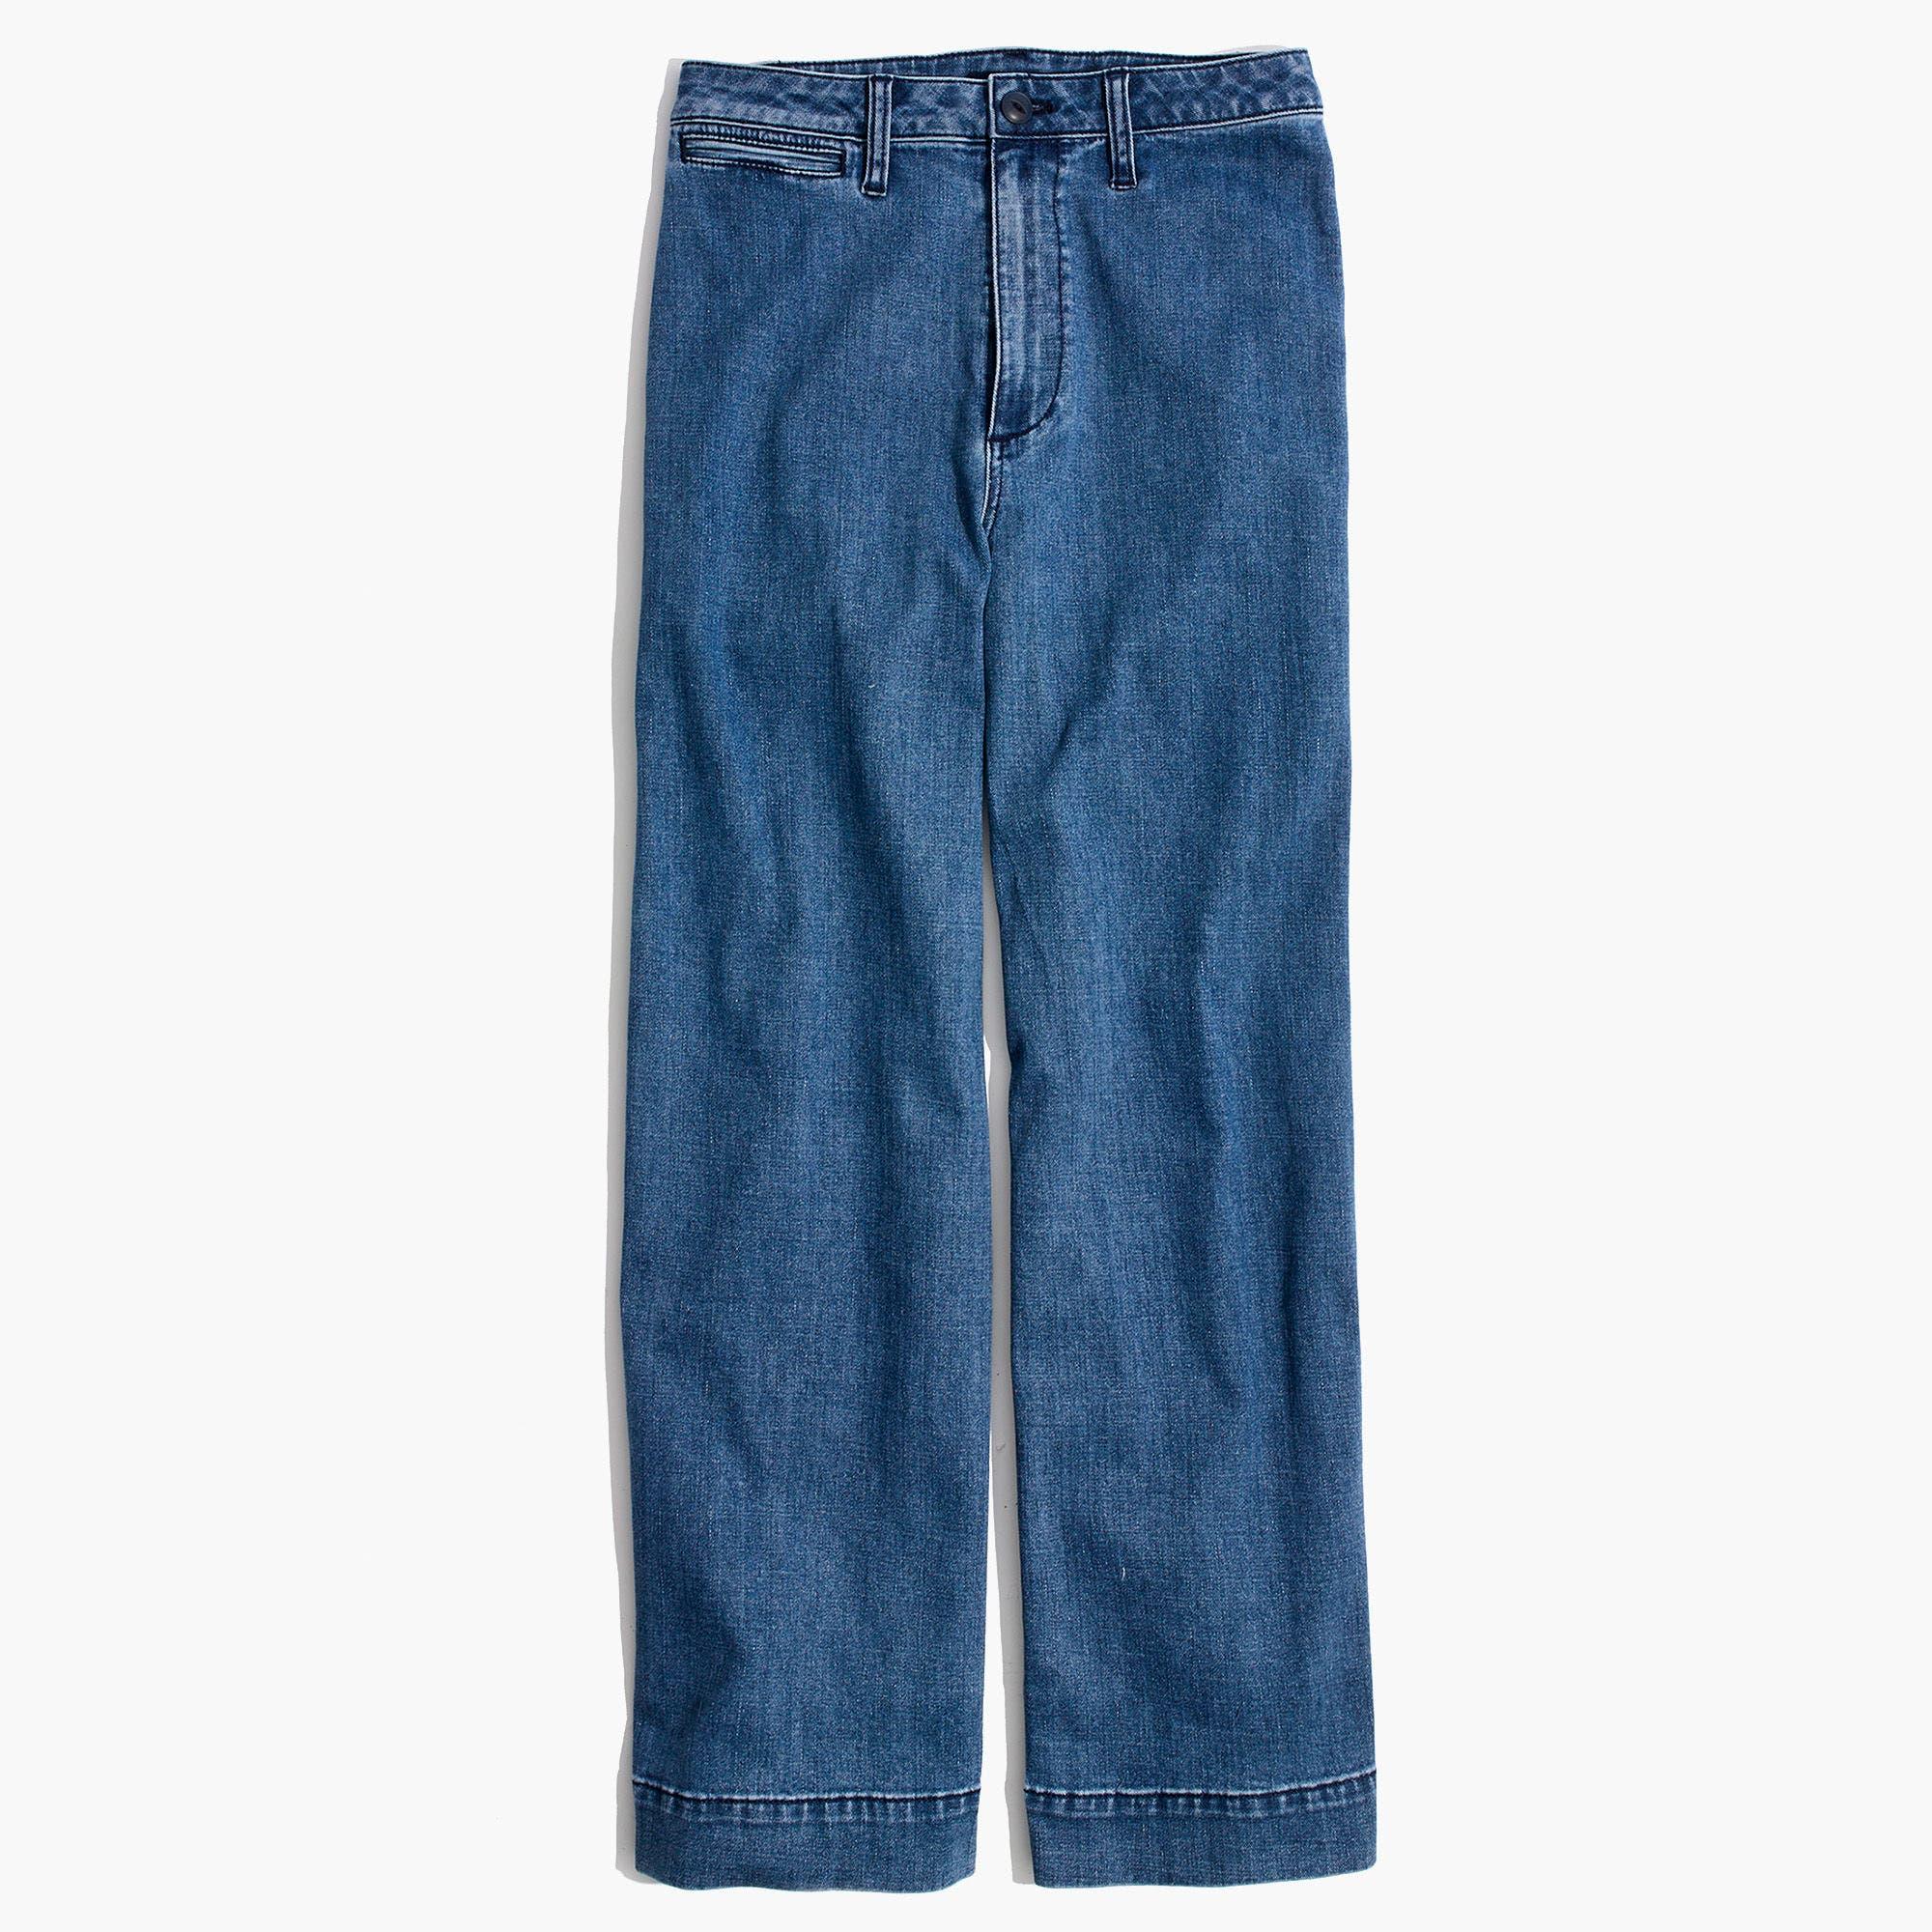 Emmett Crop Wide Leg Jeans,                             Alternate thumbnail 3, color,                             Rosalie